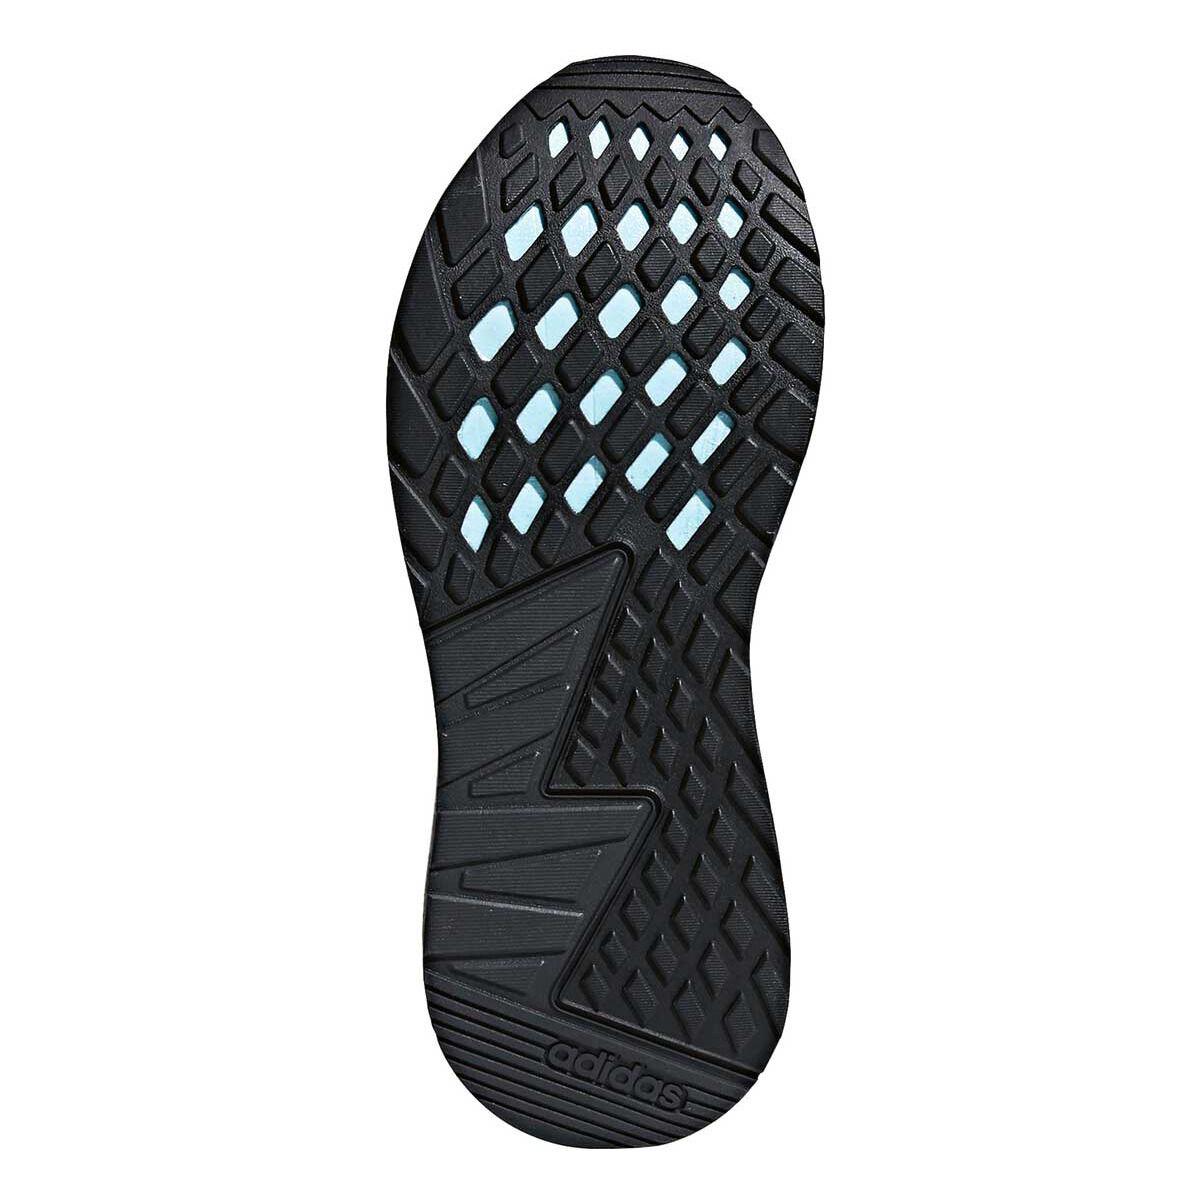 adidas / Questar TND Mujer Running Zapatos Negro / adidas Gris US 6  Rebel Sport a35a7f